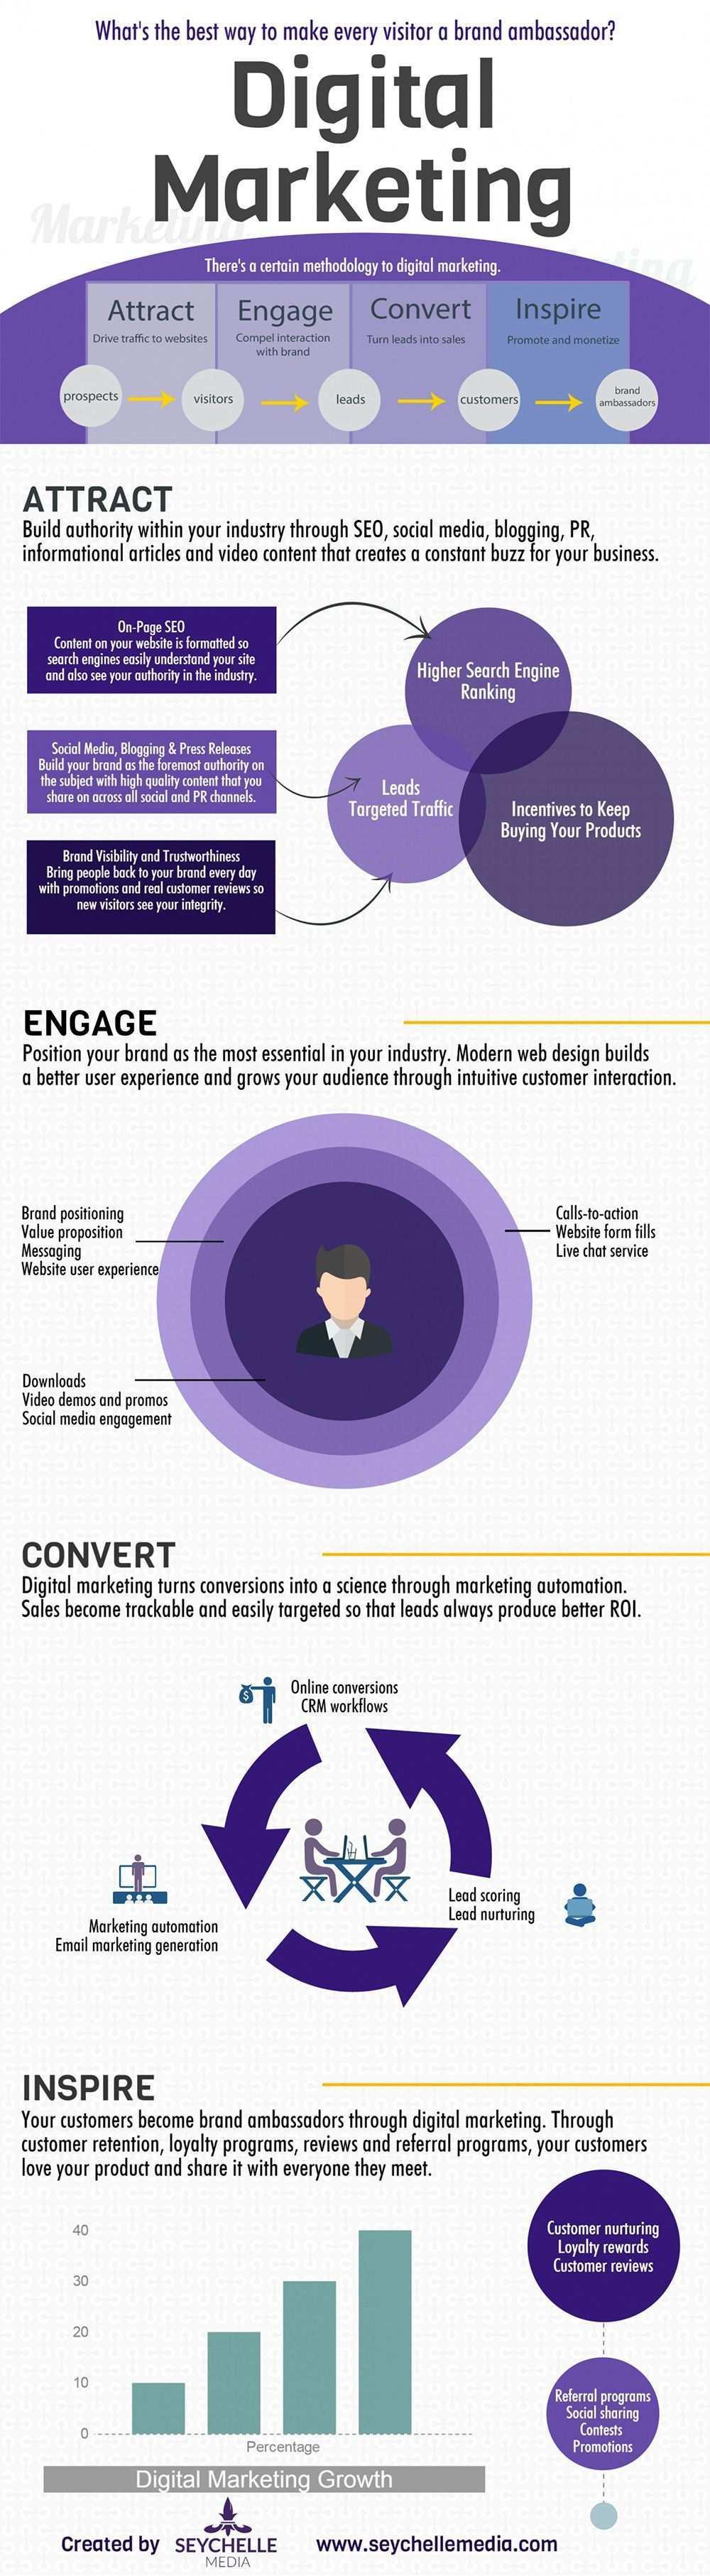 The Missing Ingredient Of Modern Marketing Digital Marketing Social Media Digital Marketing Strategy